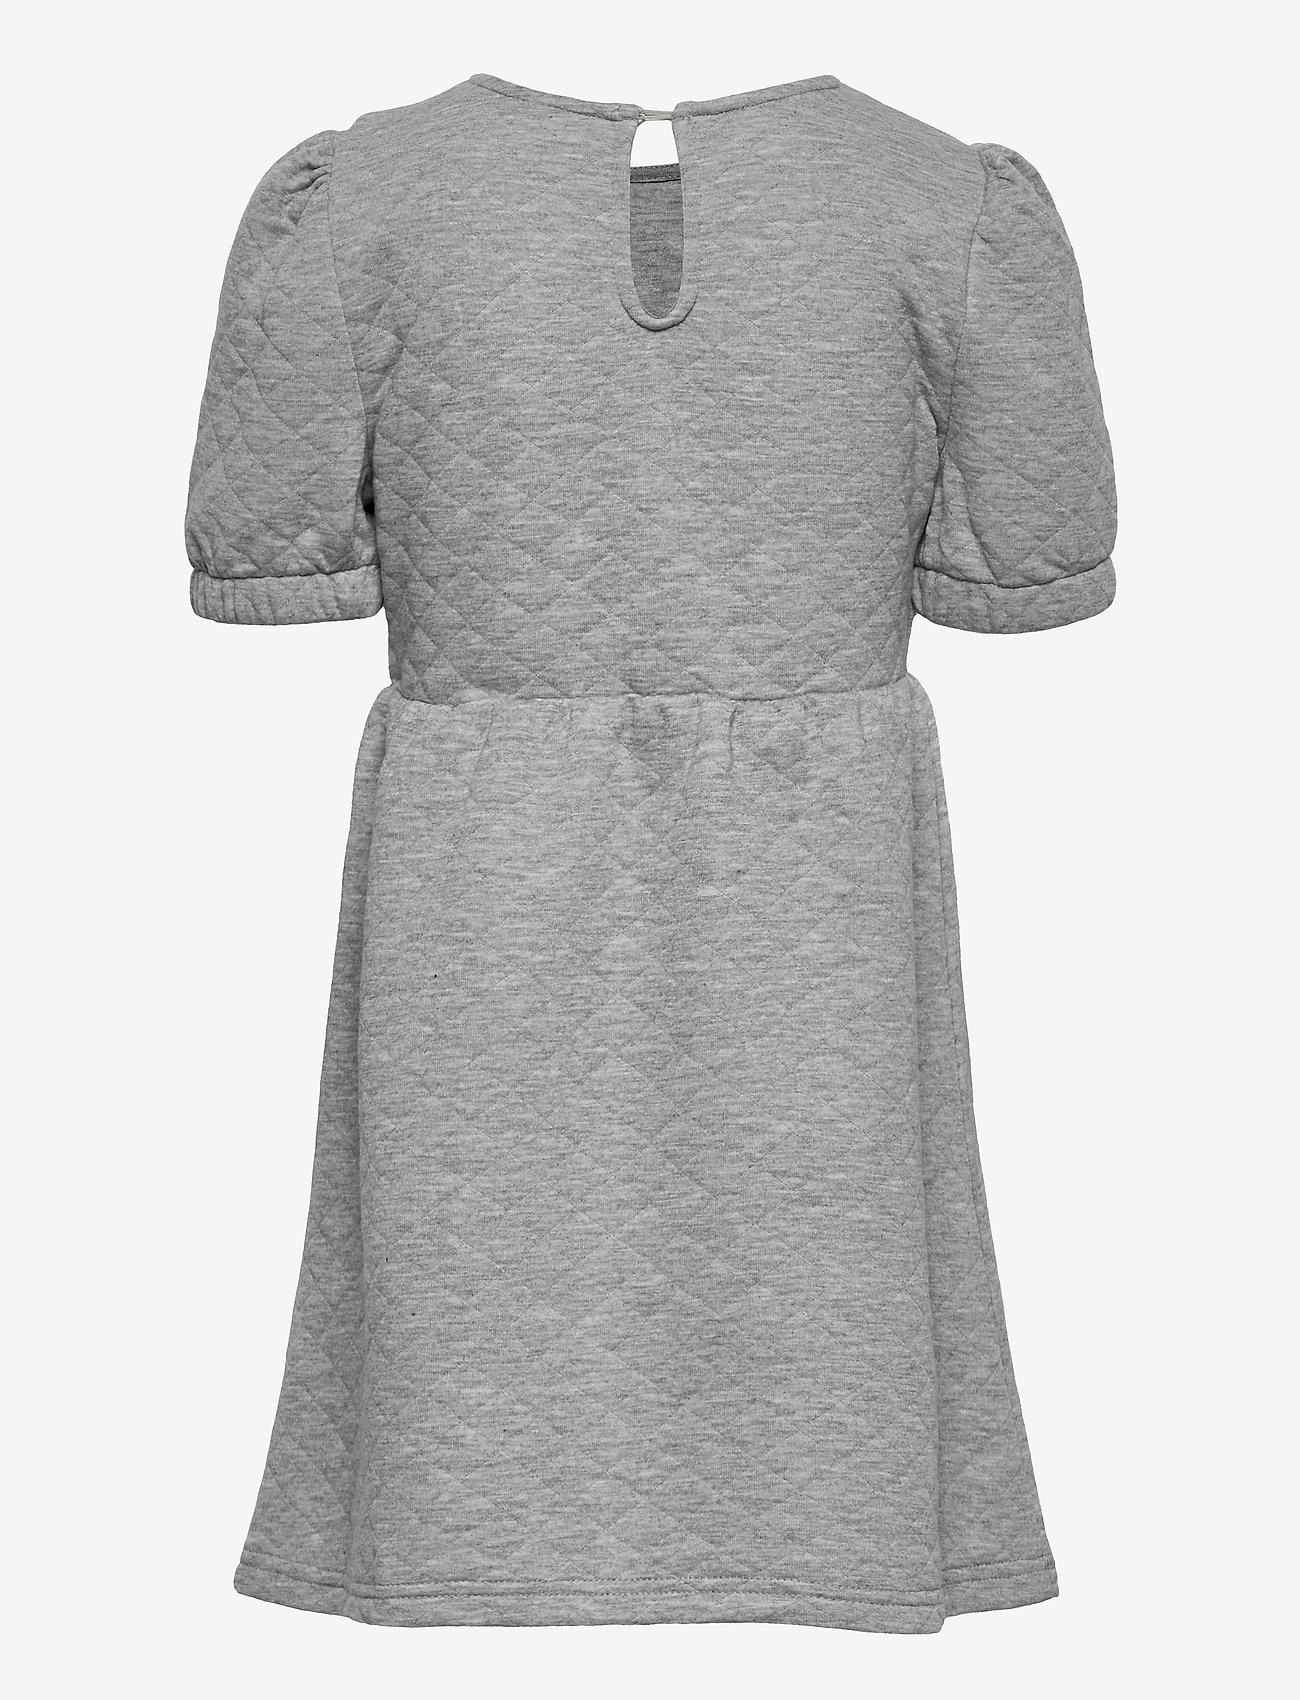 Kids Only - KONMEDINA S/S PUFF DRESS SWT - kleider - light grey melange - 1